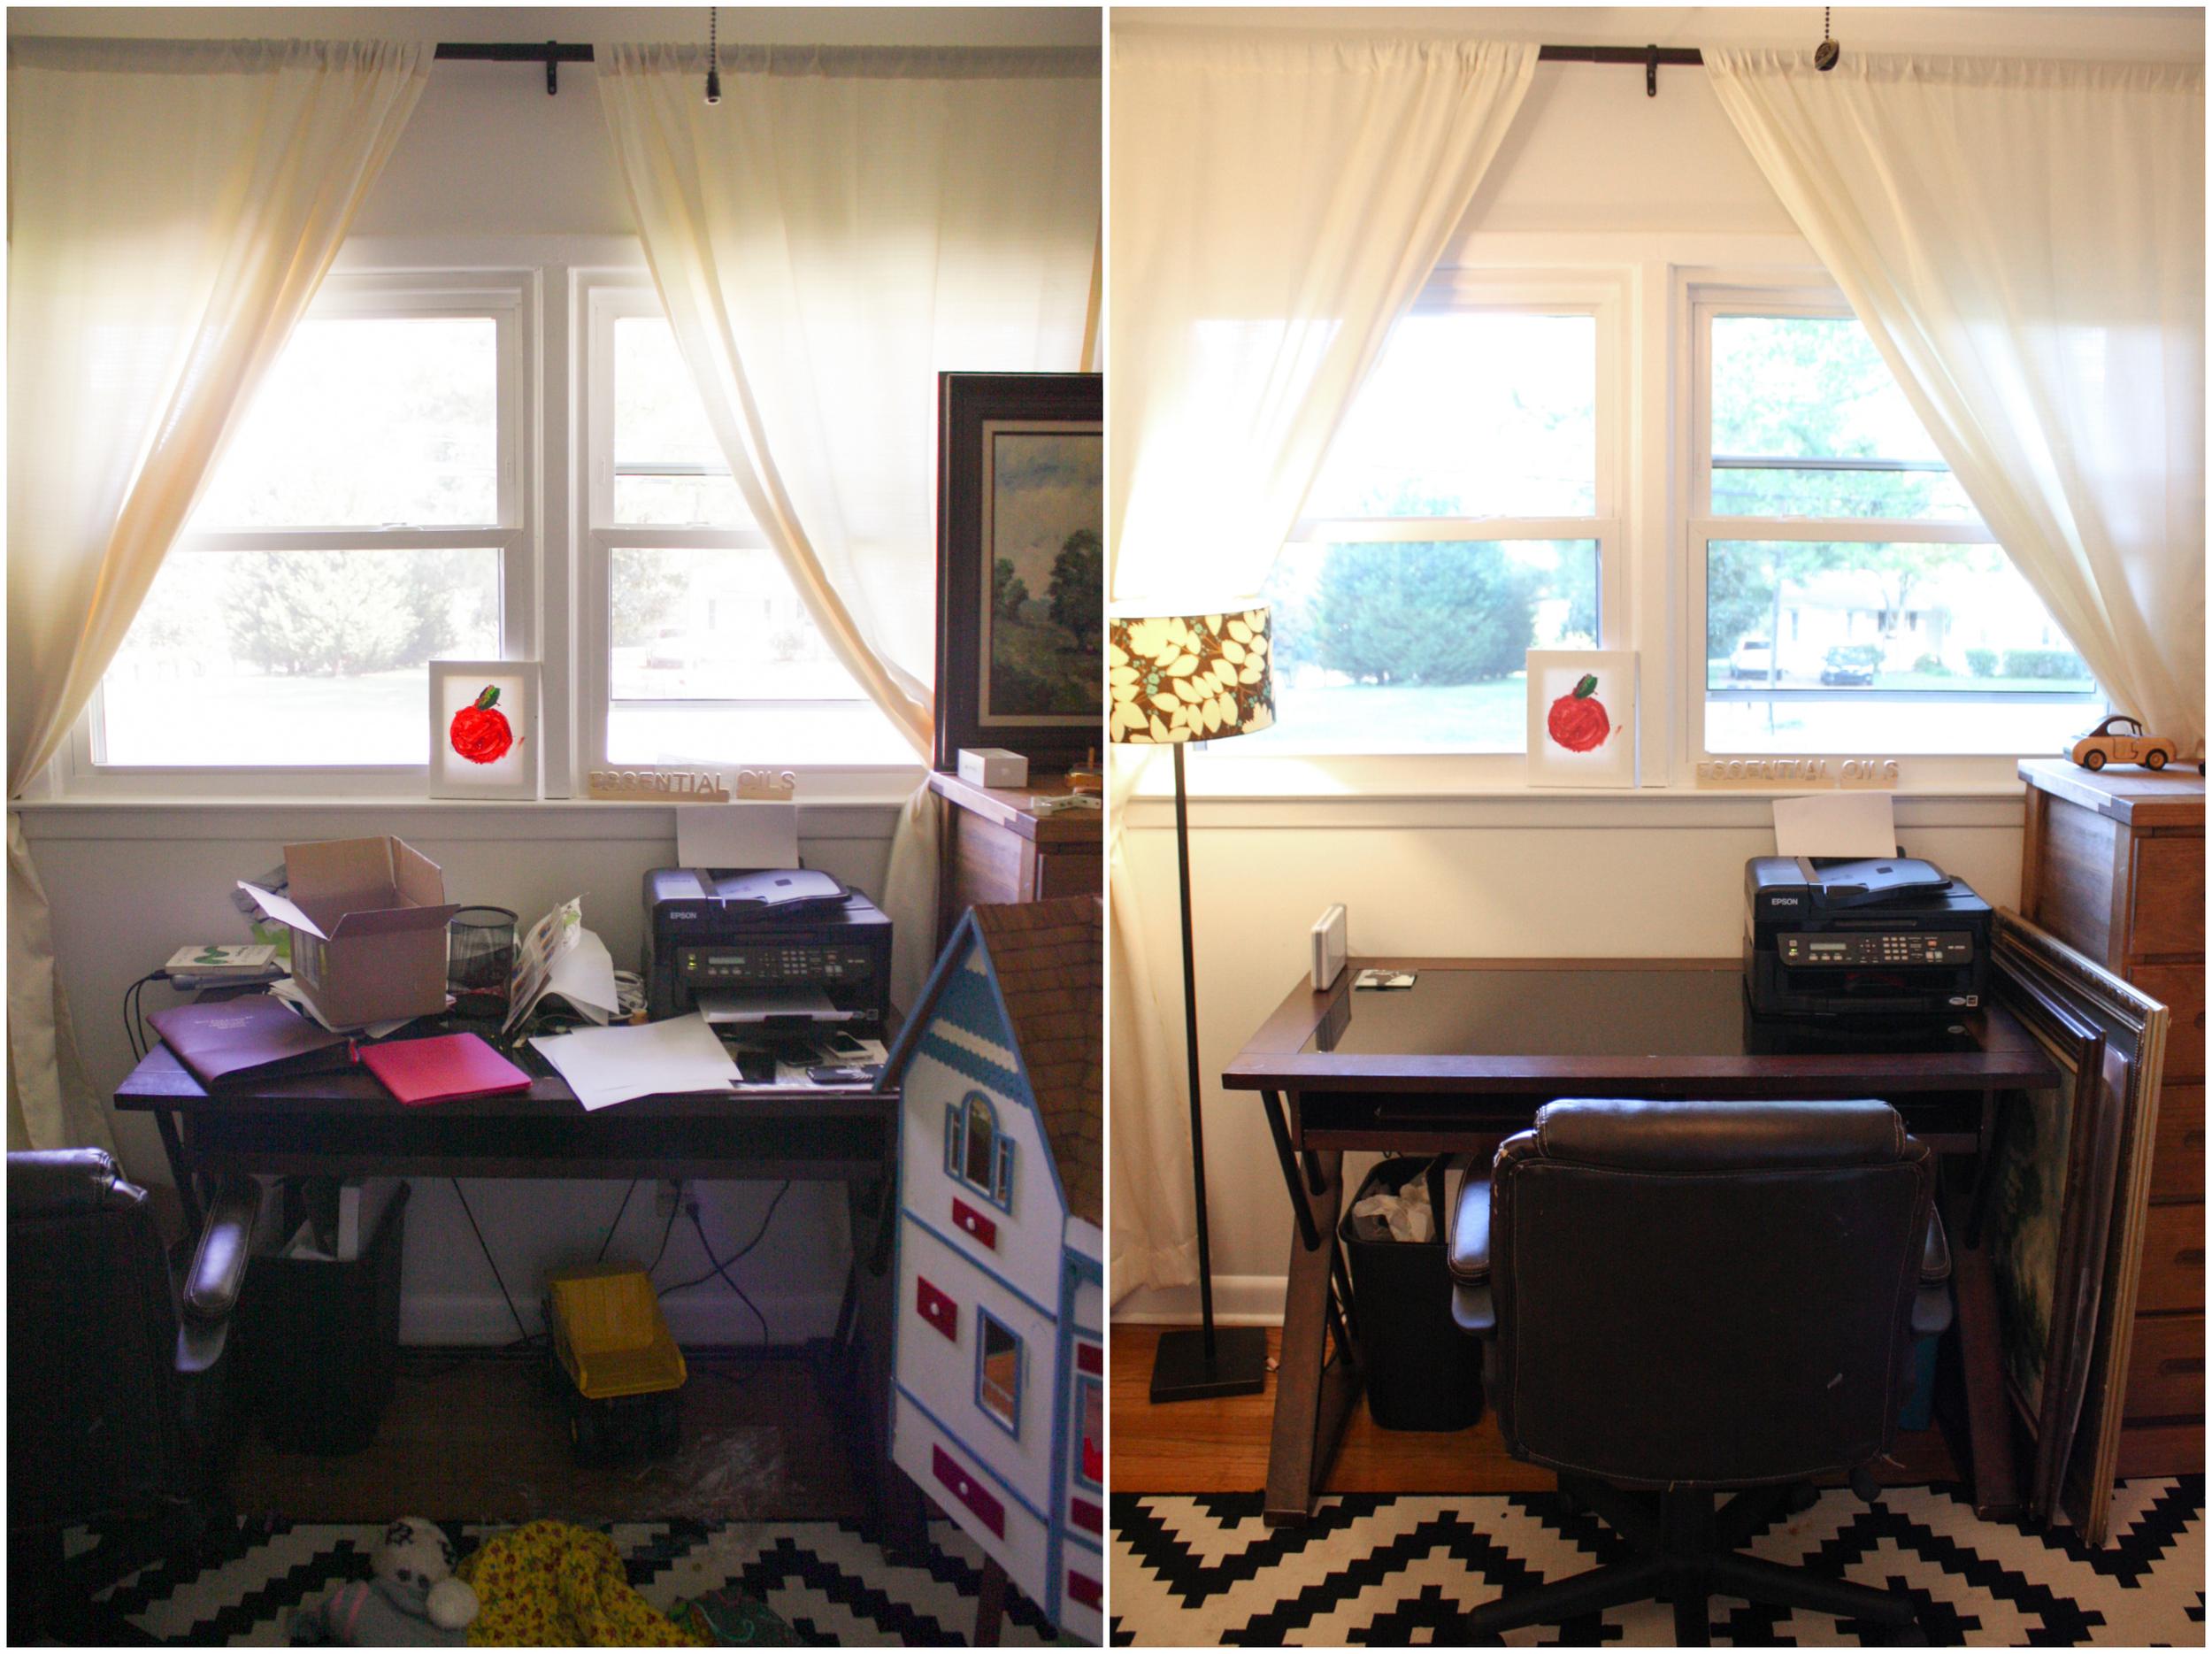 _Handrich_01 desk_before after.jpg